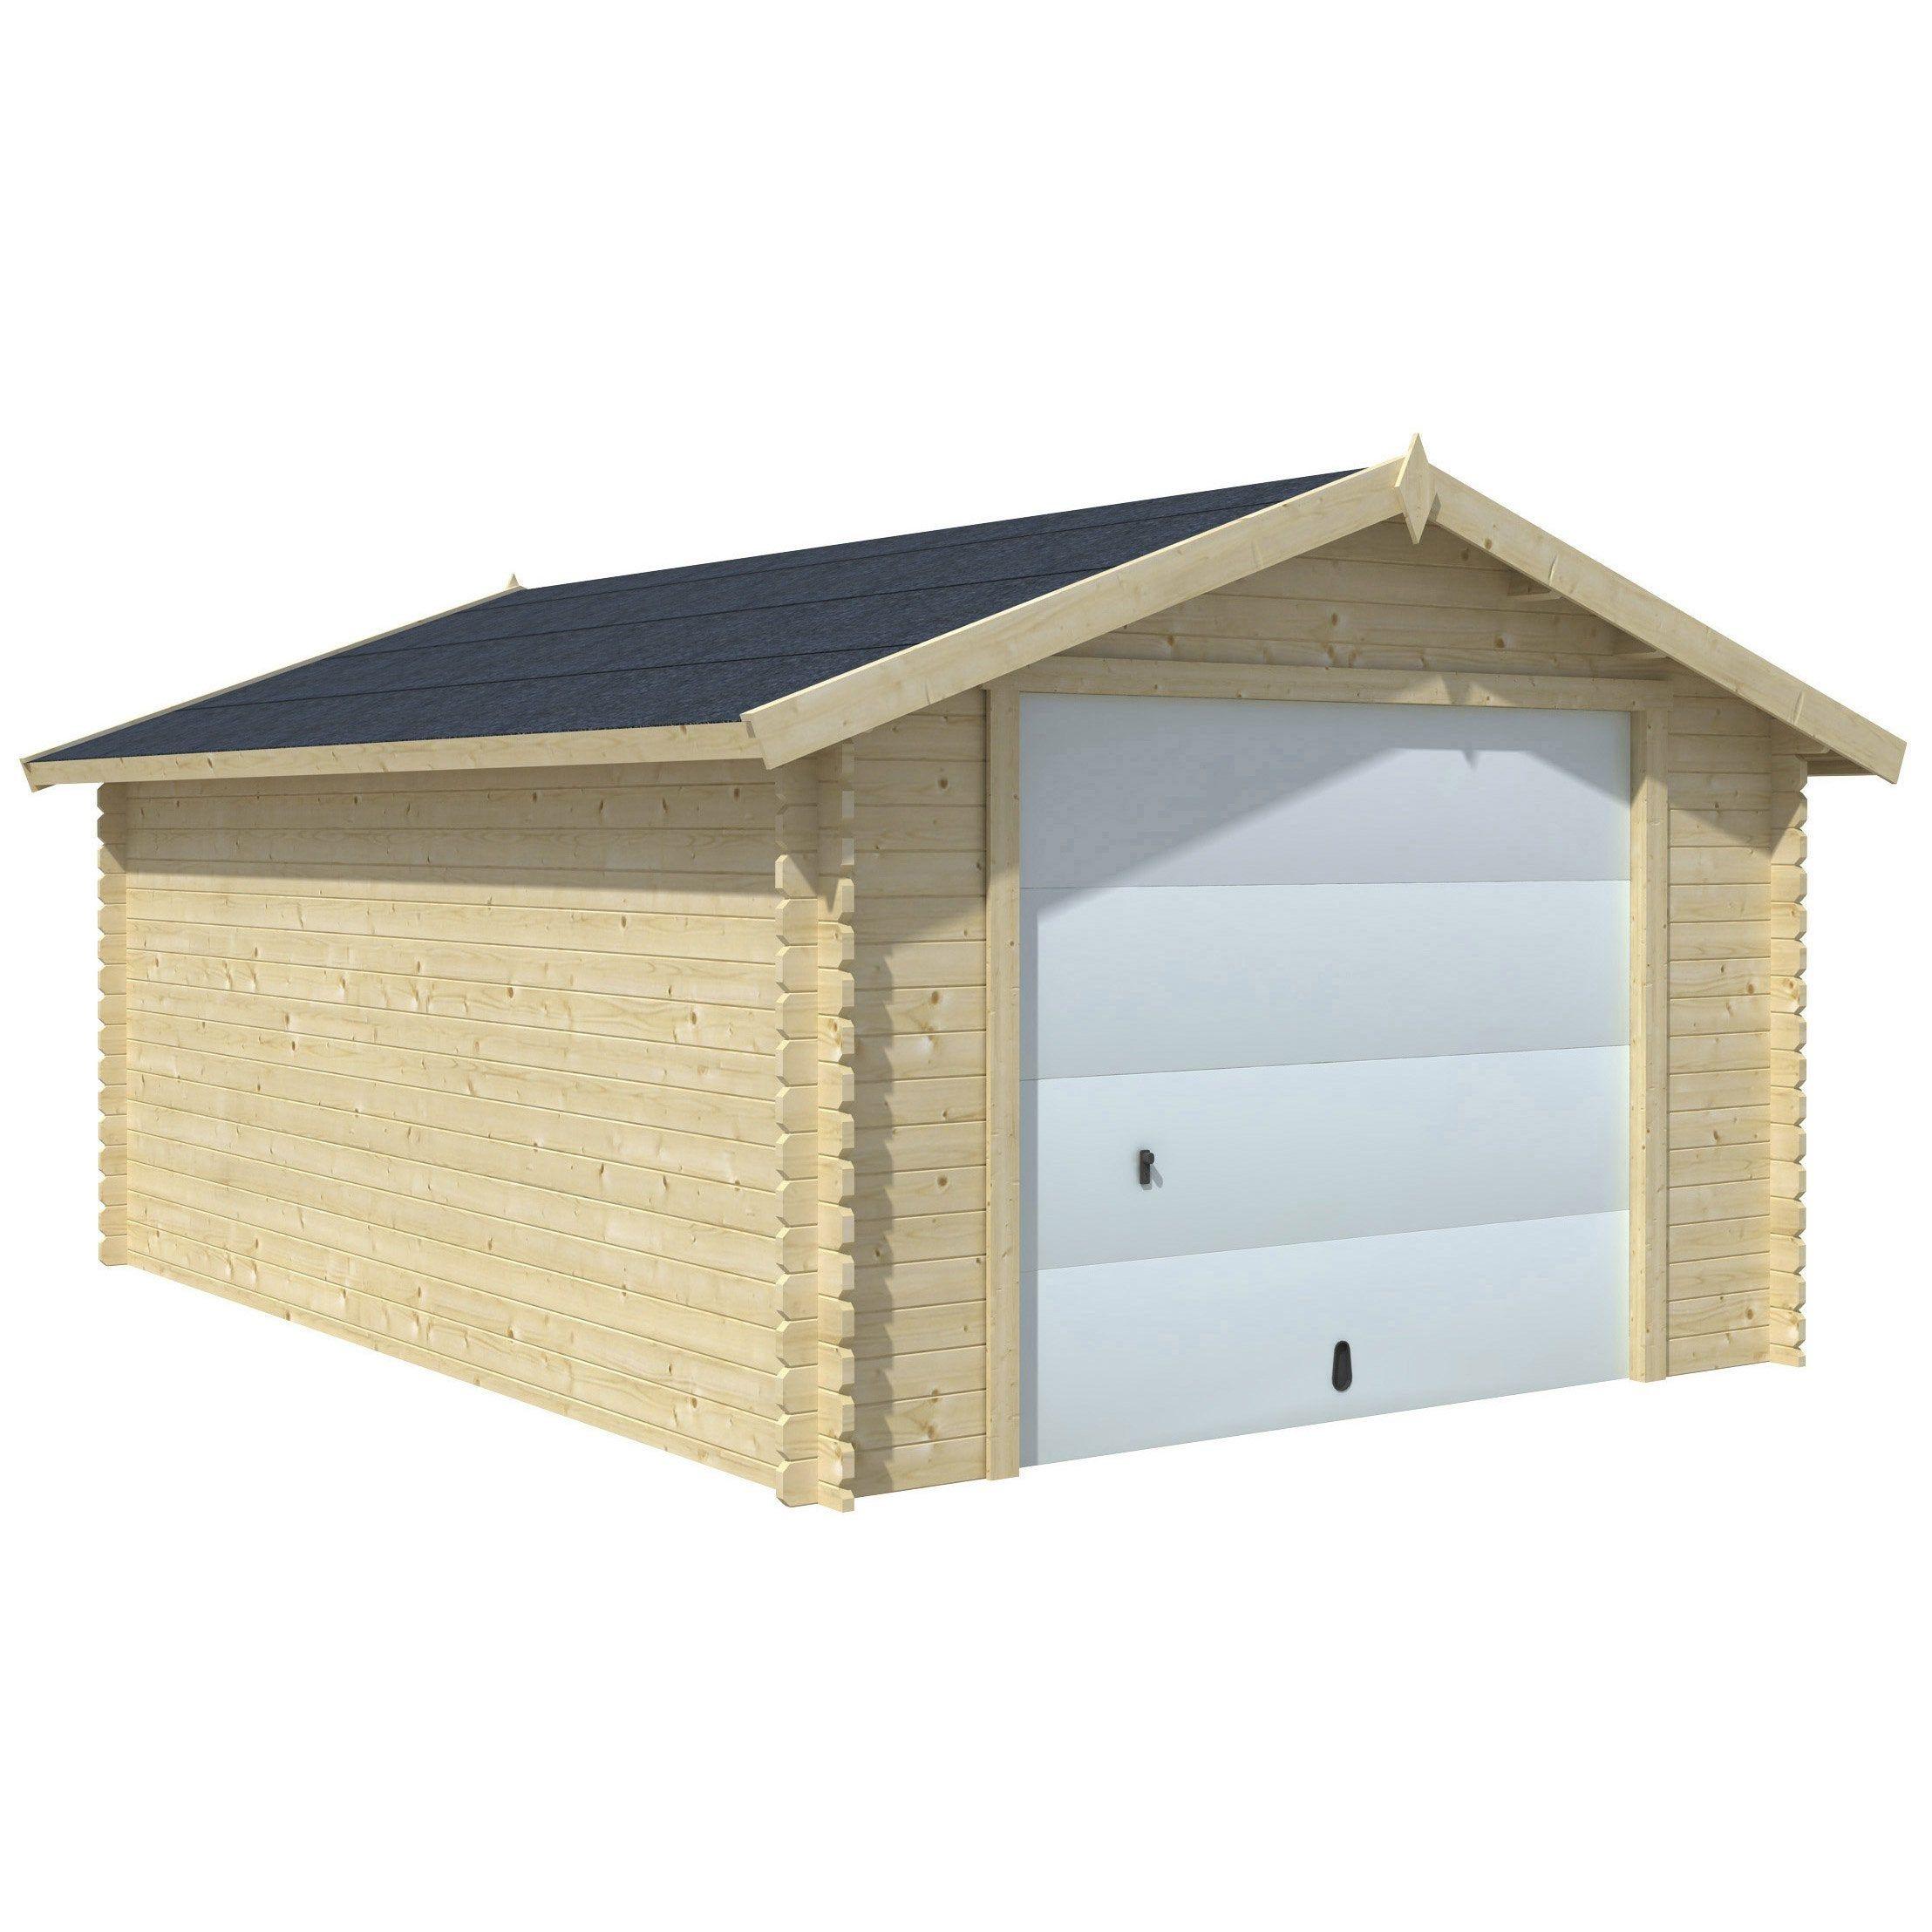 Garage Bois Nova 1 Voiture, 16.91 M² So Garden | Abri De ... tout Abri Moto Pas Cher